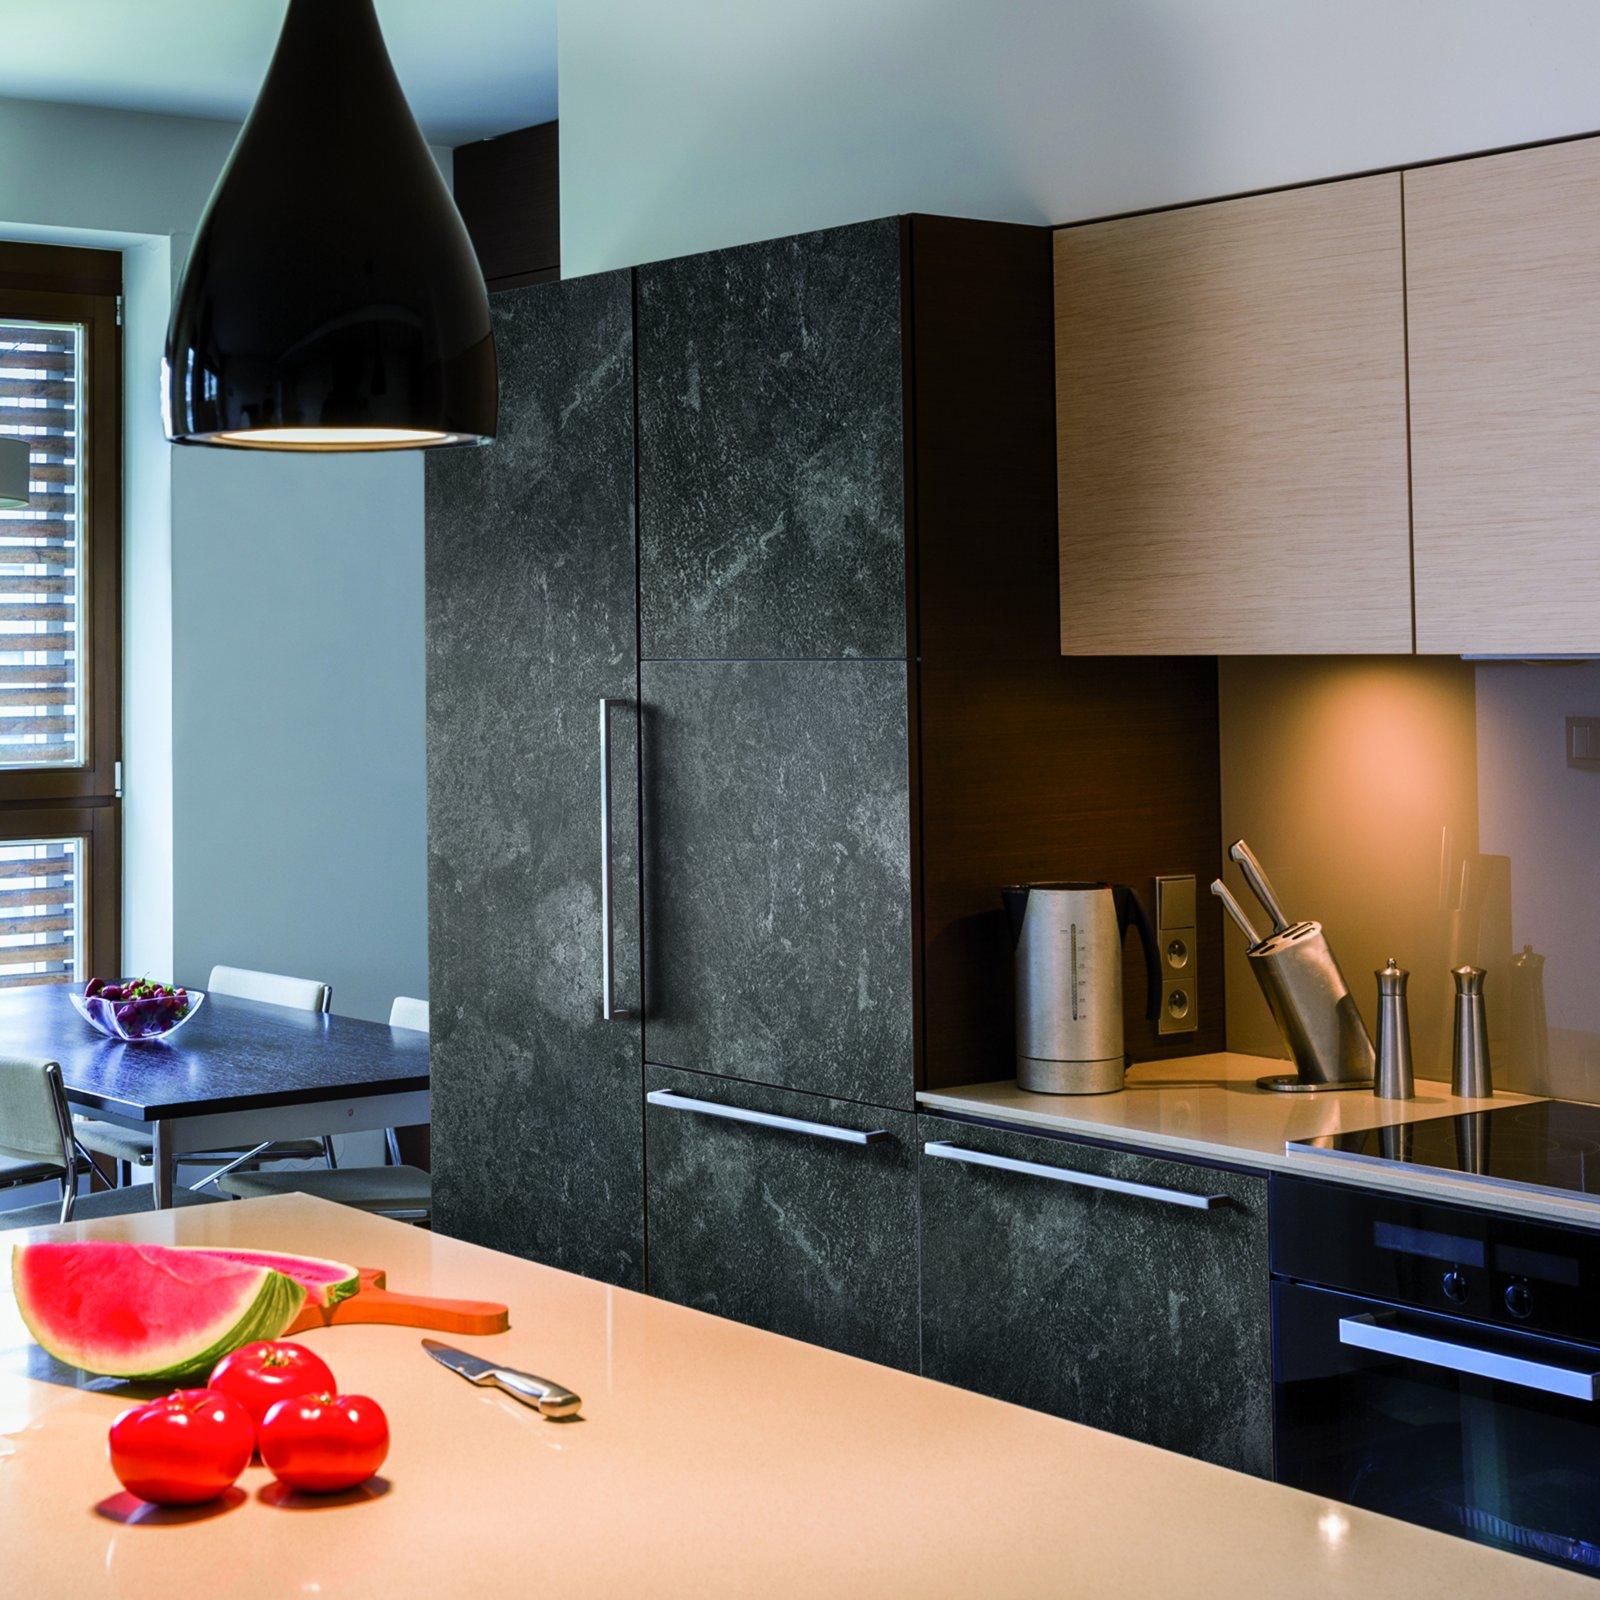 d-c fix Klebefolie AVELLINO BETON - grau - 45x200 cm | Dekor ...